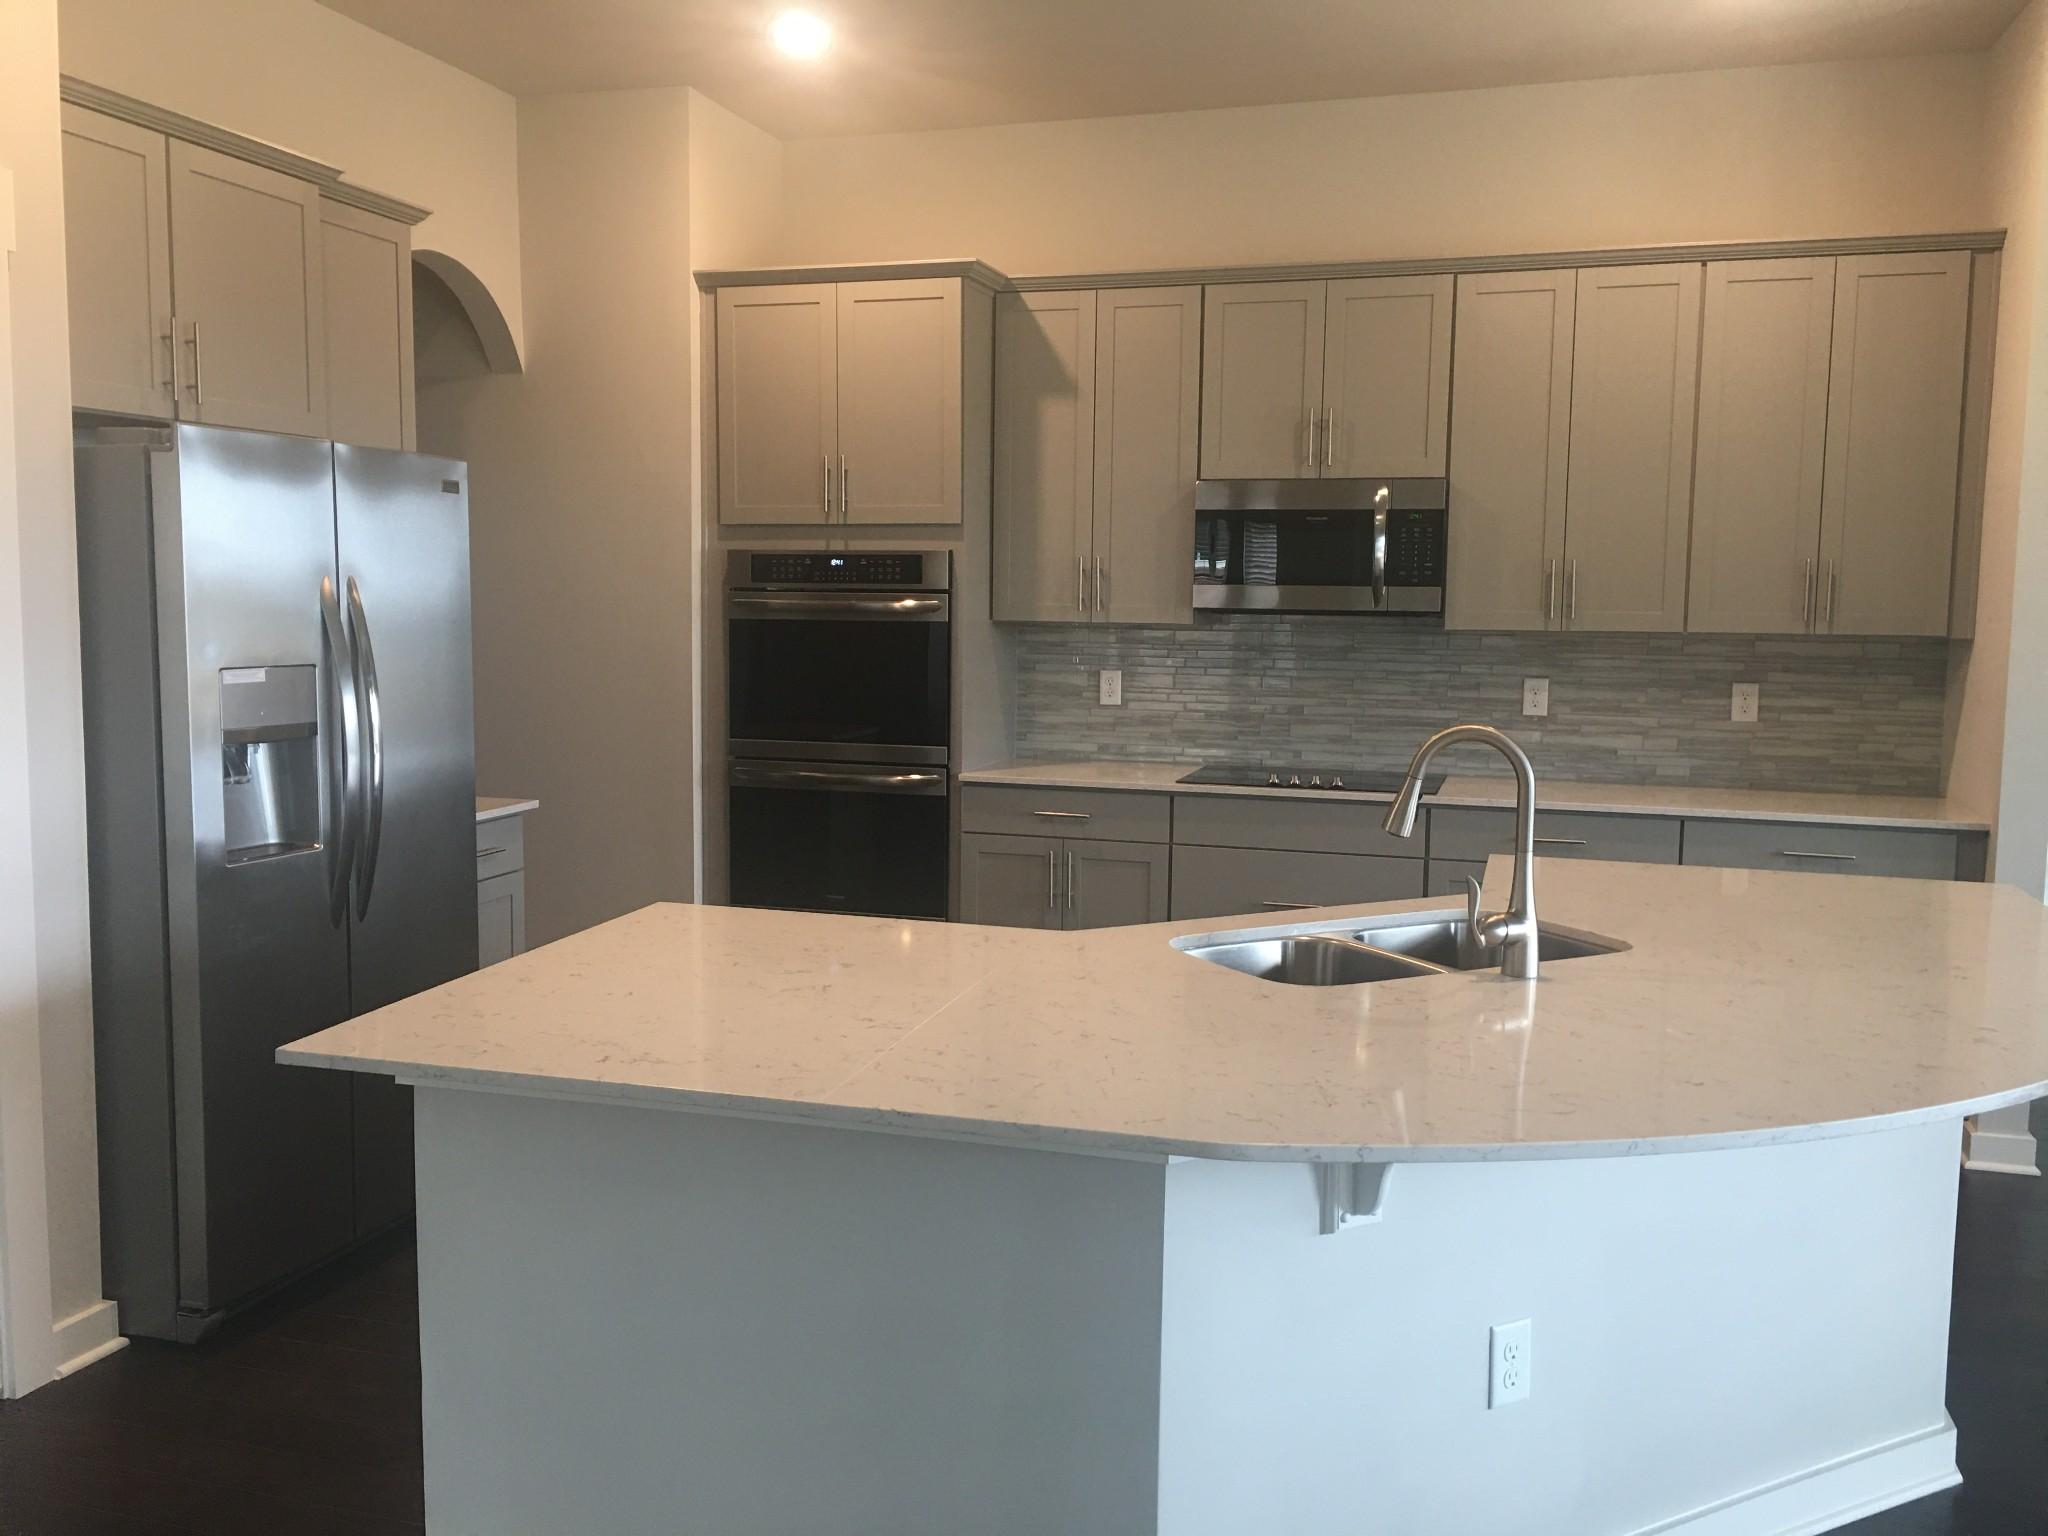 1634 Burrows Ave CHO 130, Murfreesboro, TN 37129 - Murfreesboro, TN real estate listing